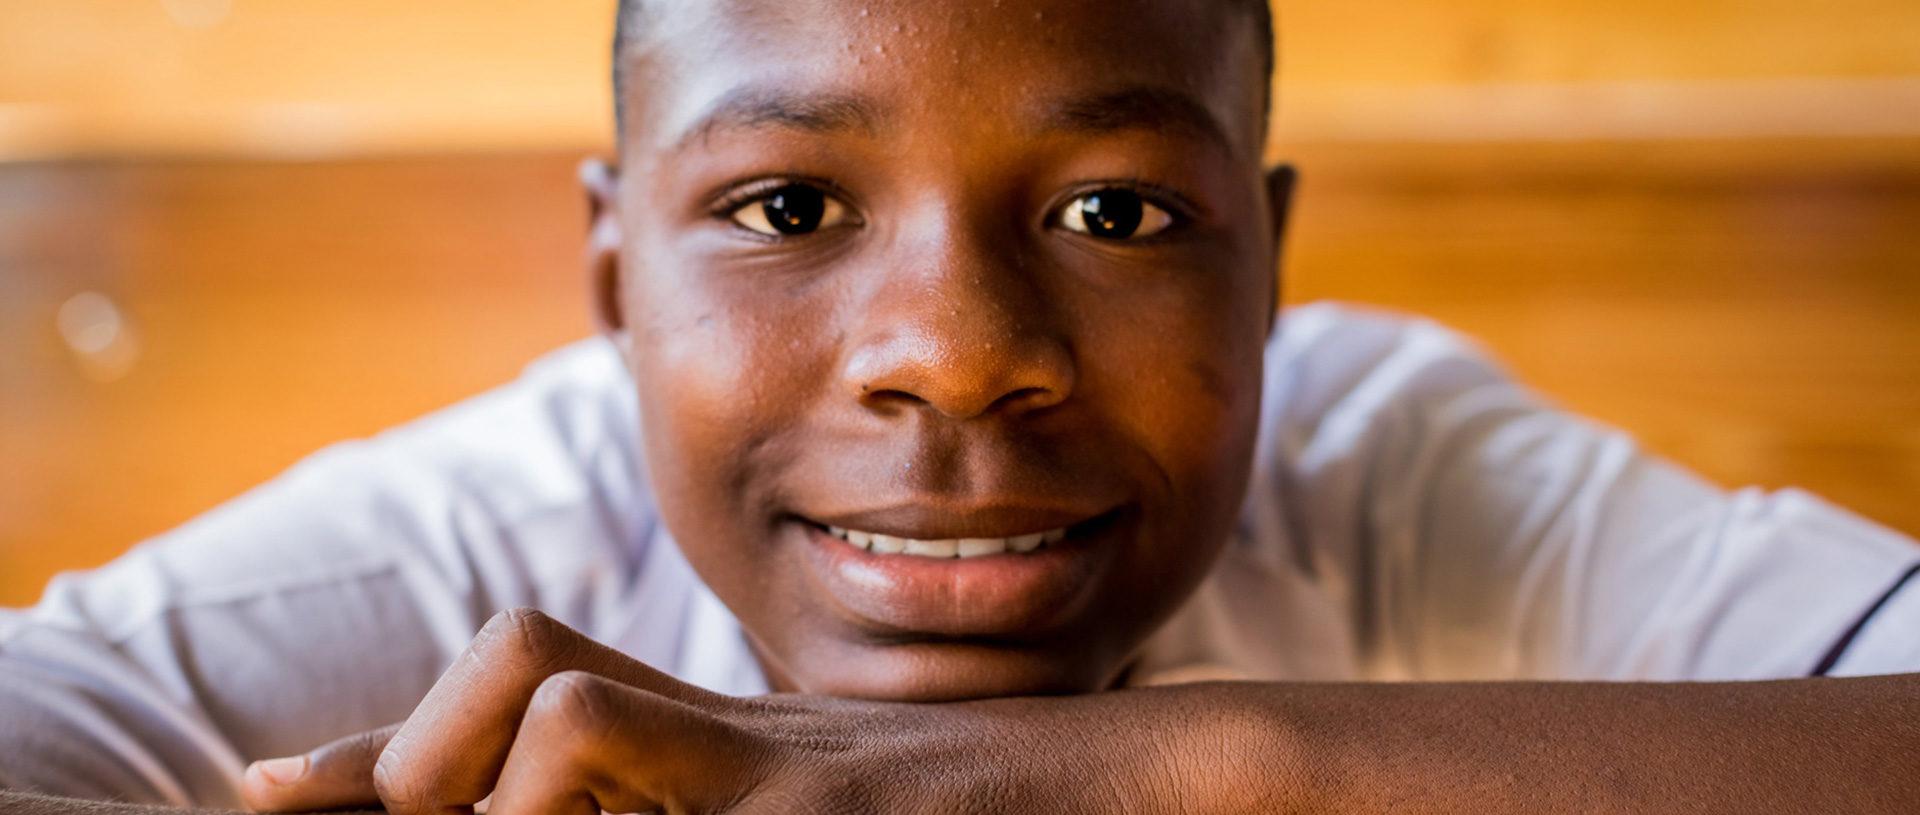 serving hope to children in Haiti banner